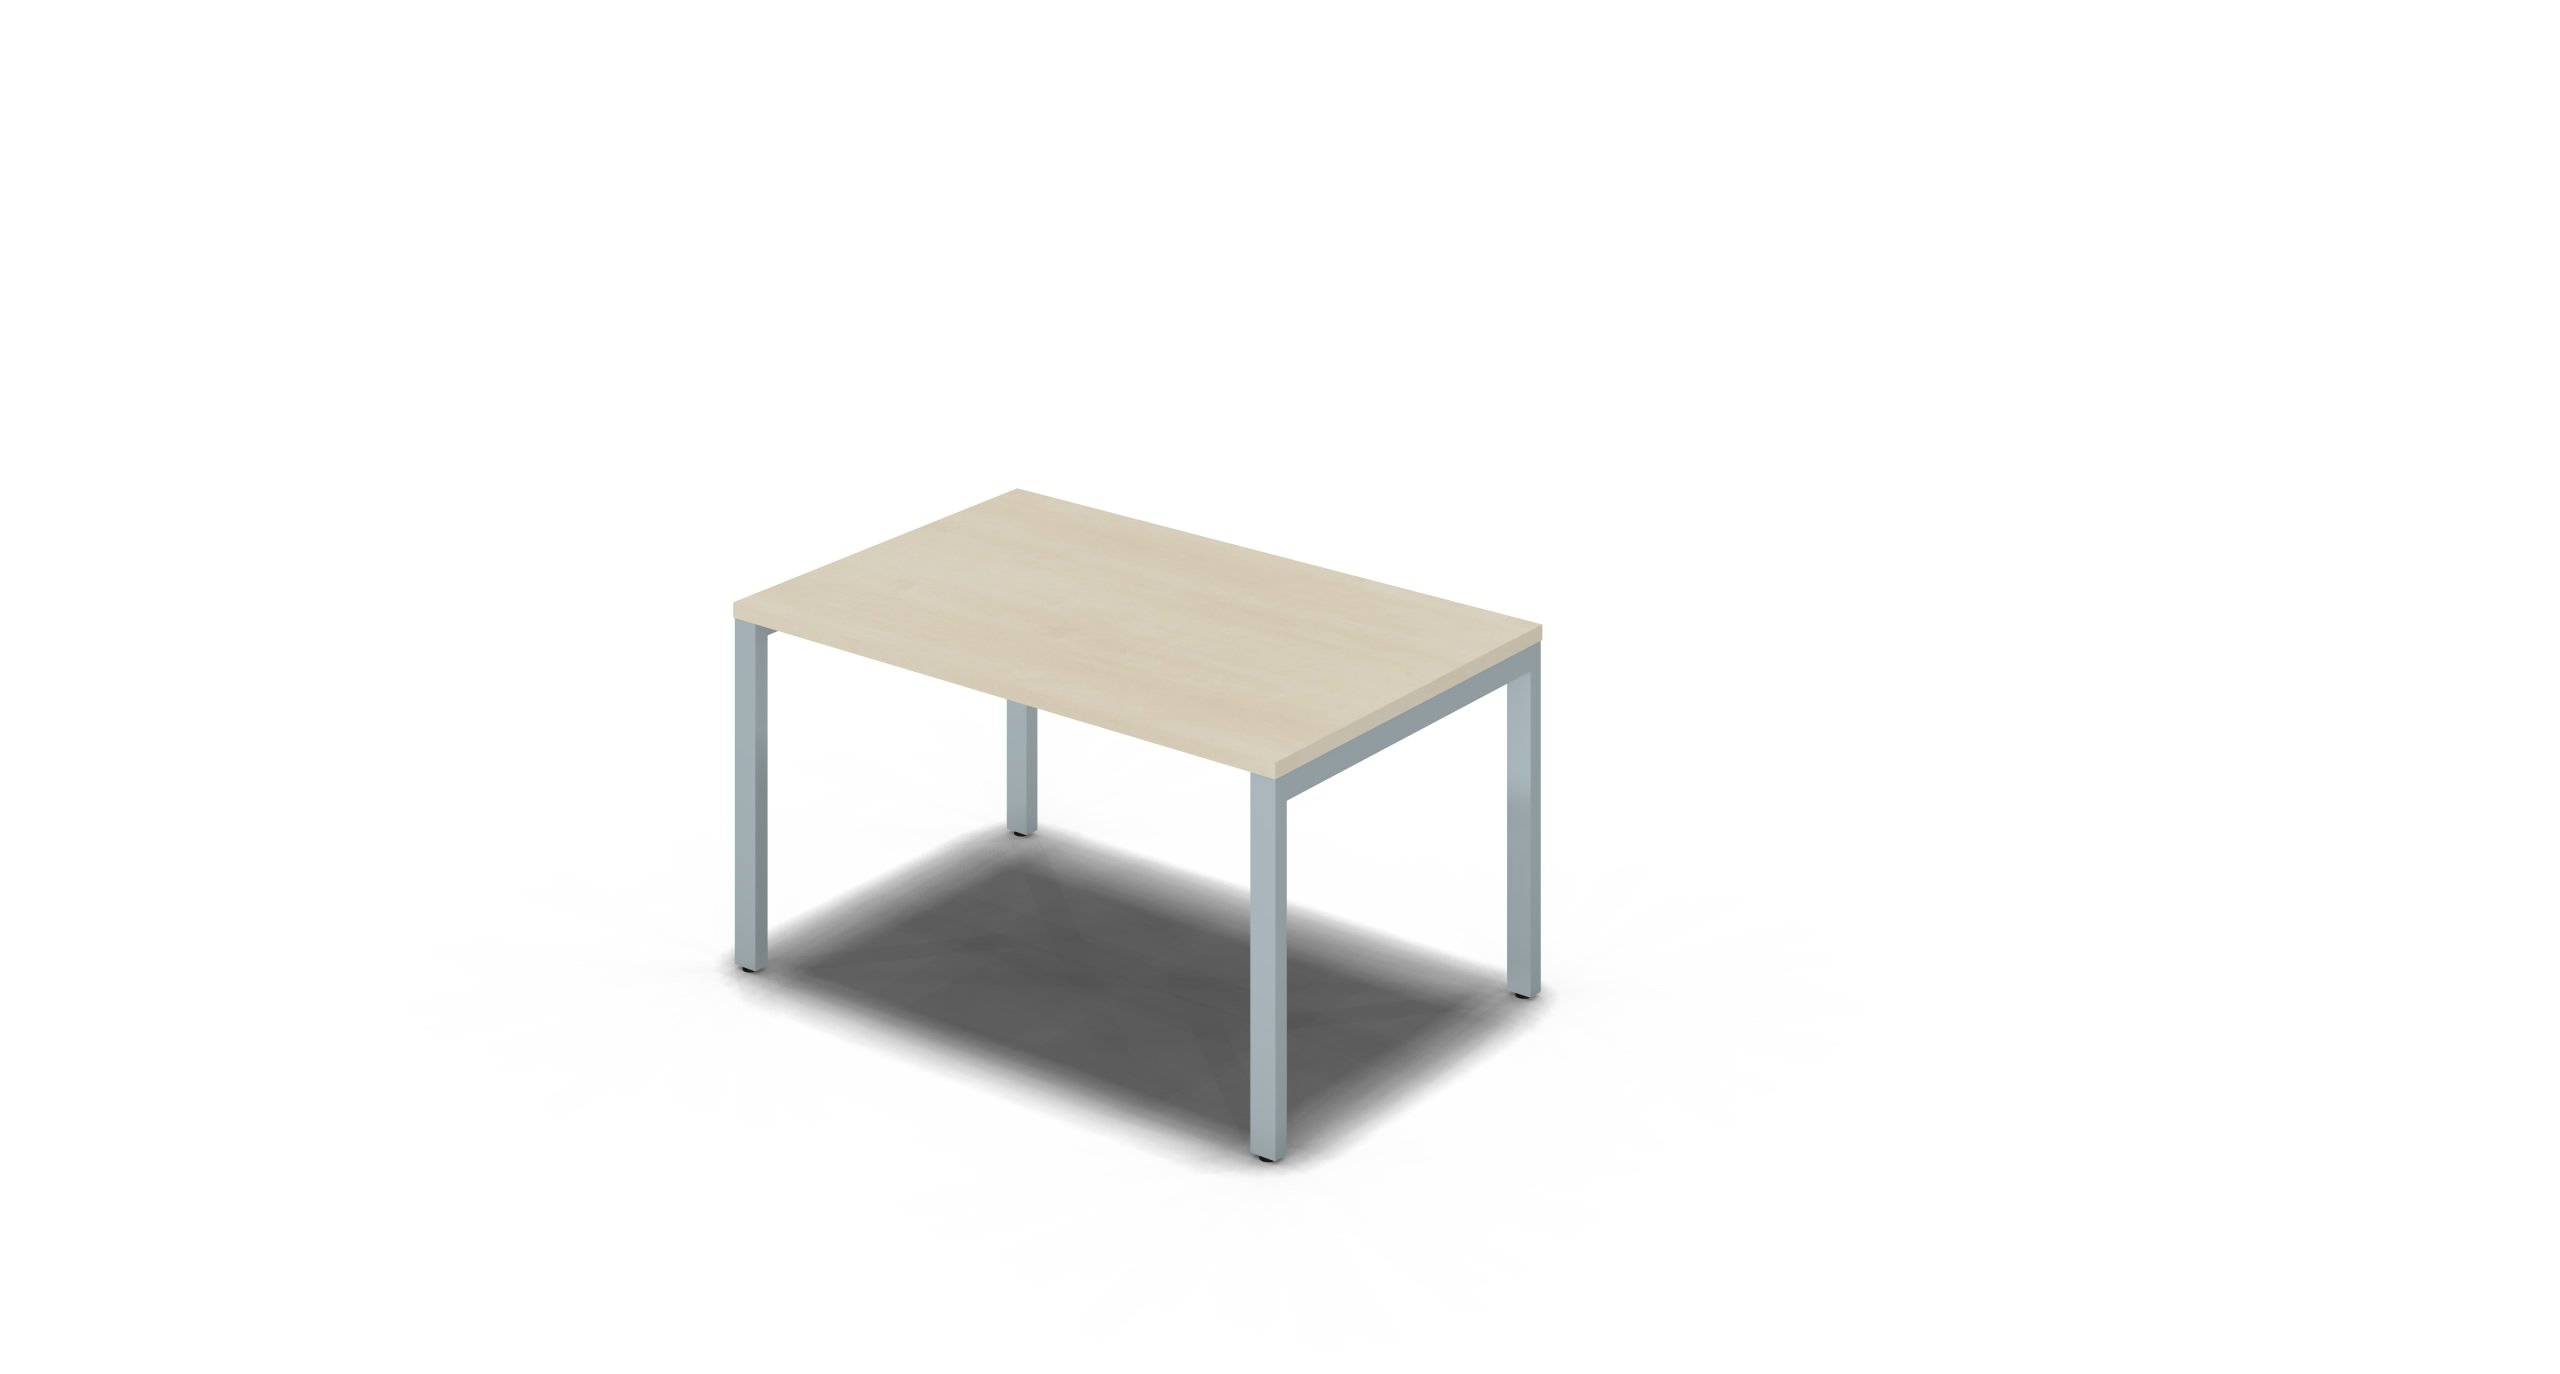 Table_Square_1200x750_Silver_Maple_noOption